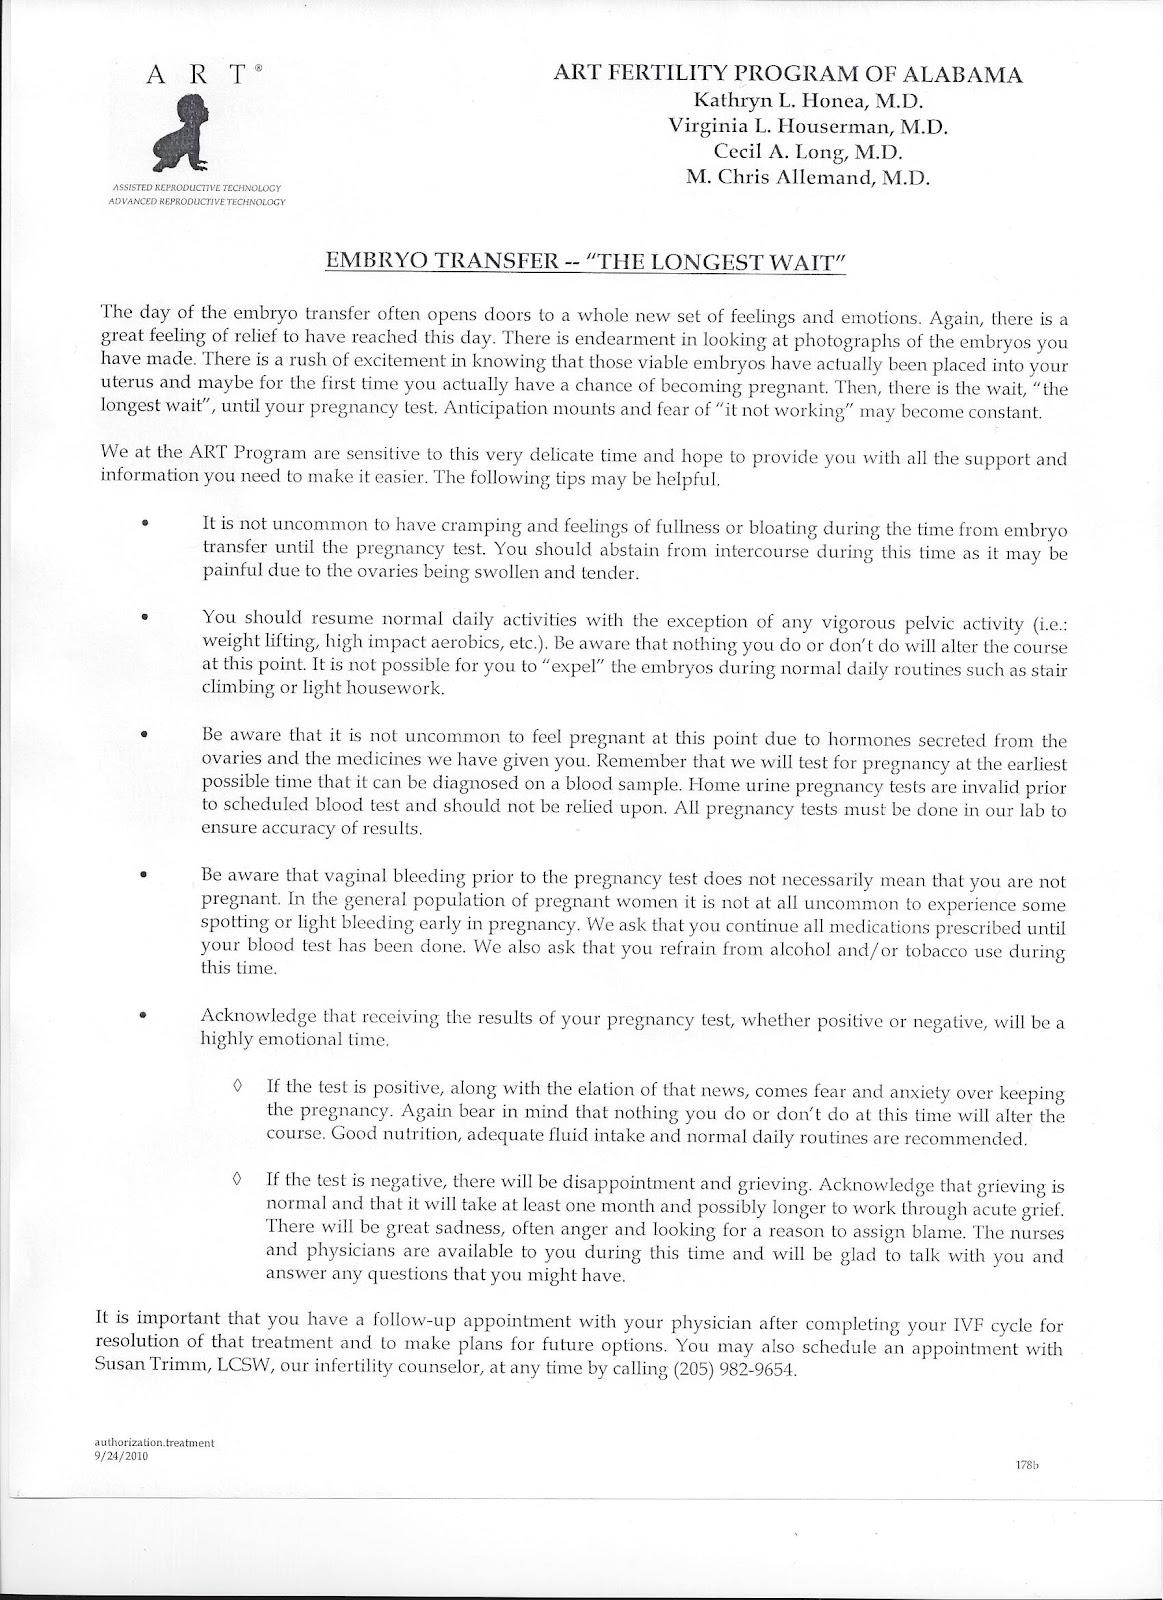 Gender discrimination essay in hindi image 5